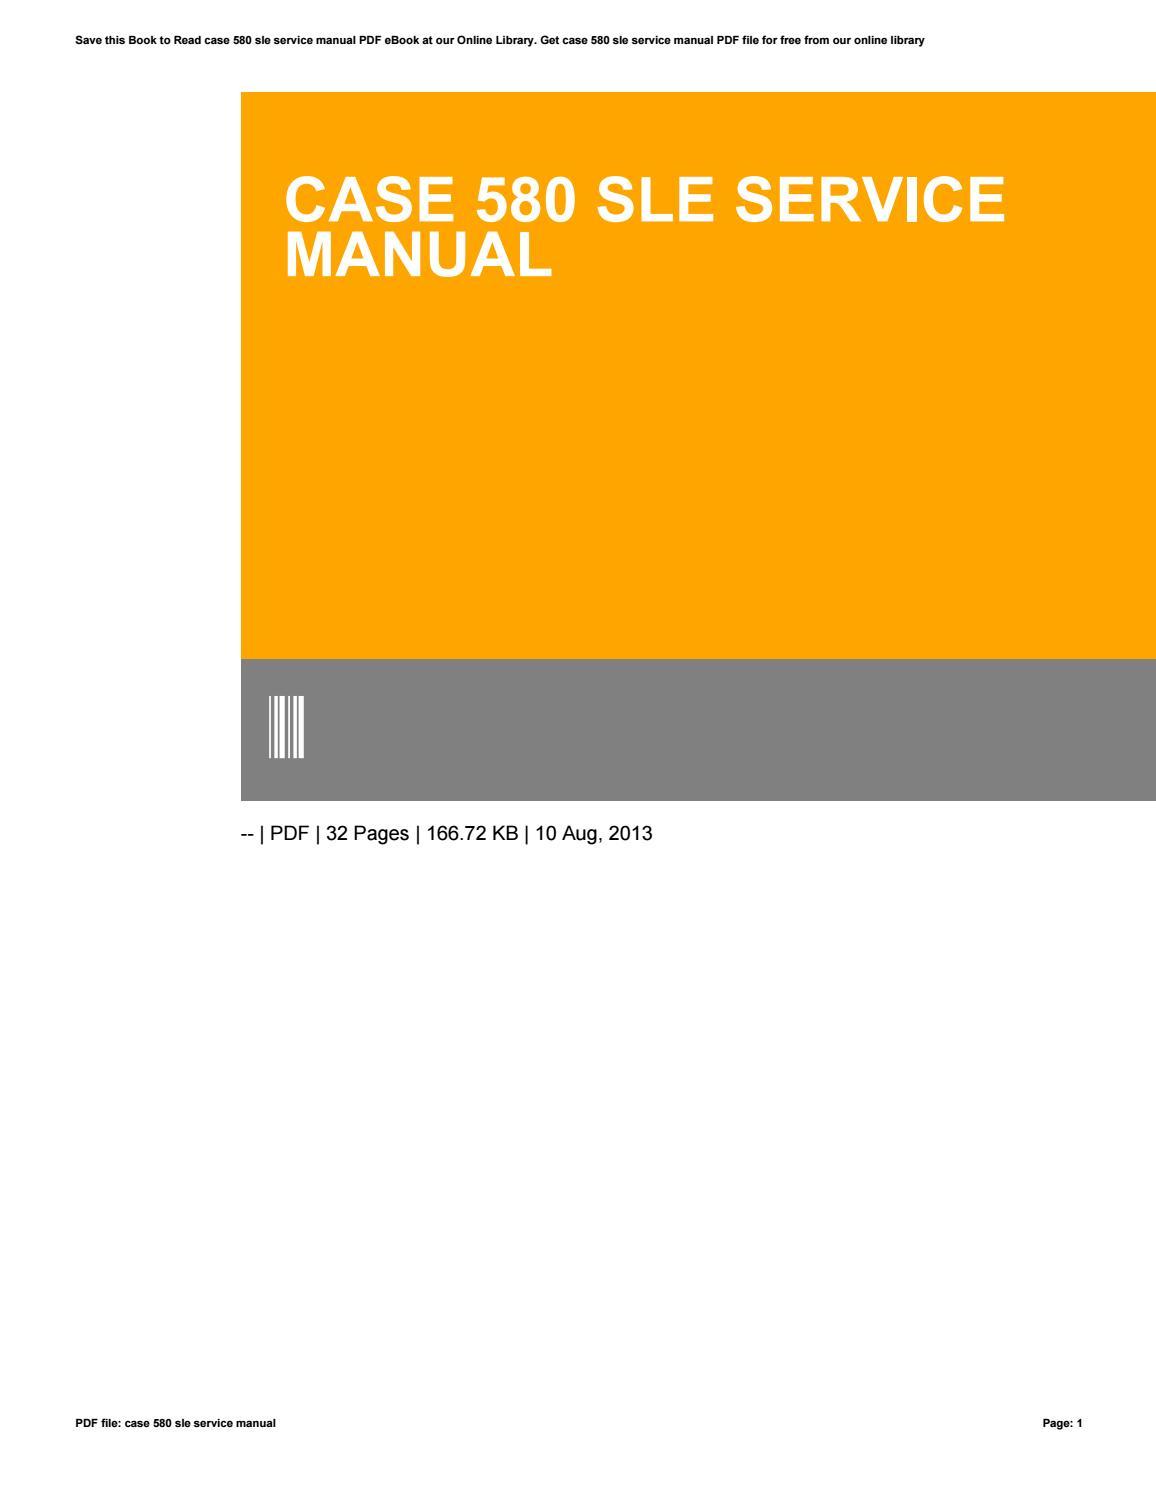 Case service manual ebook case 580 sle service manual array case 580 sle service manual by laoho352 issuu rh issuu fandeluxe Gallery